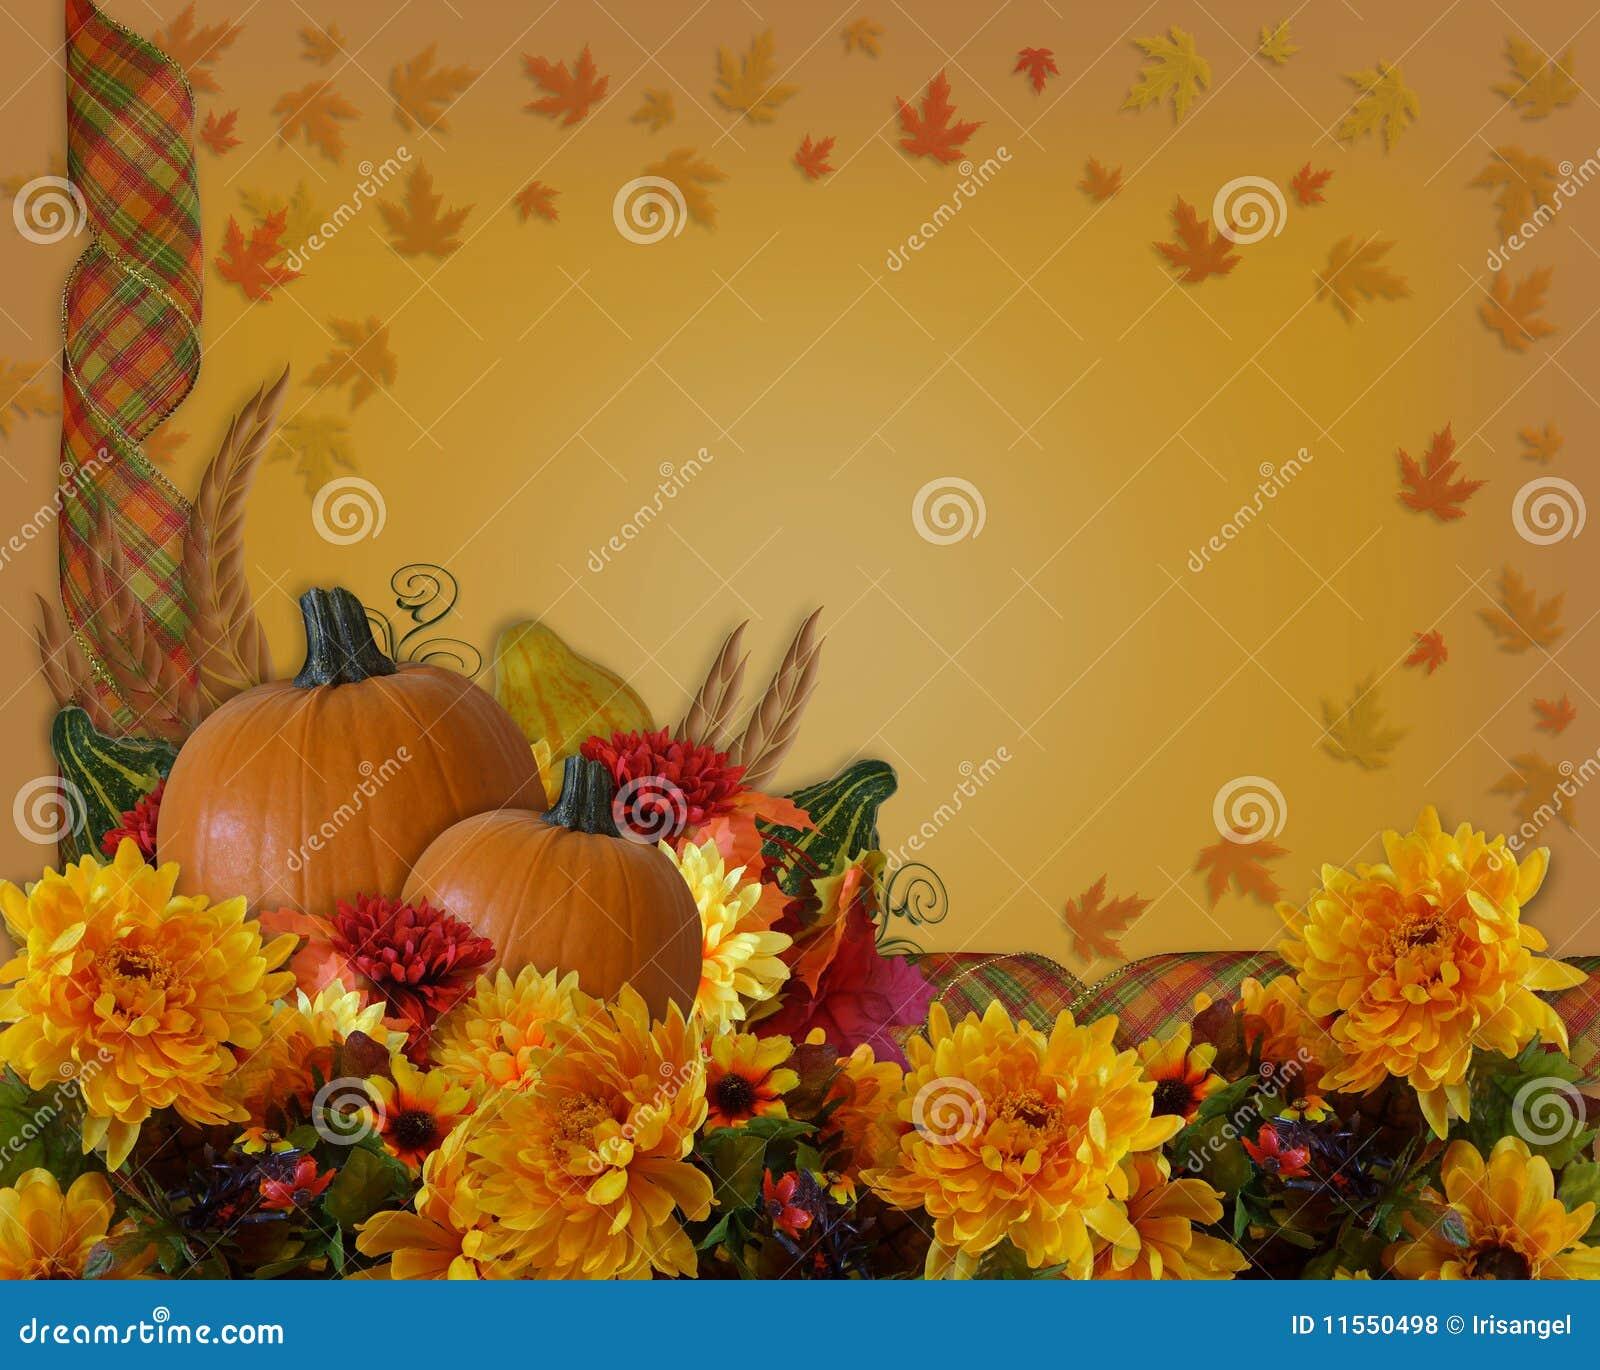 Thanksgiving Autumn Background Border Royalty Free Stock ...